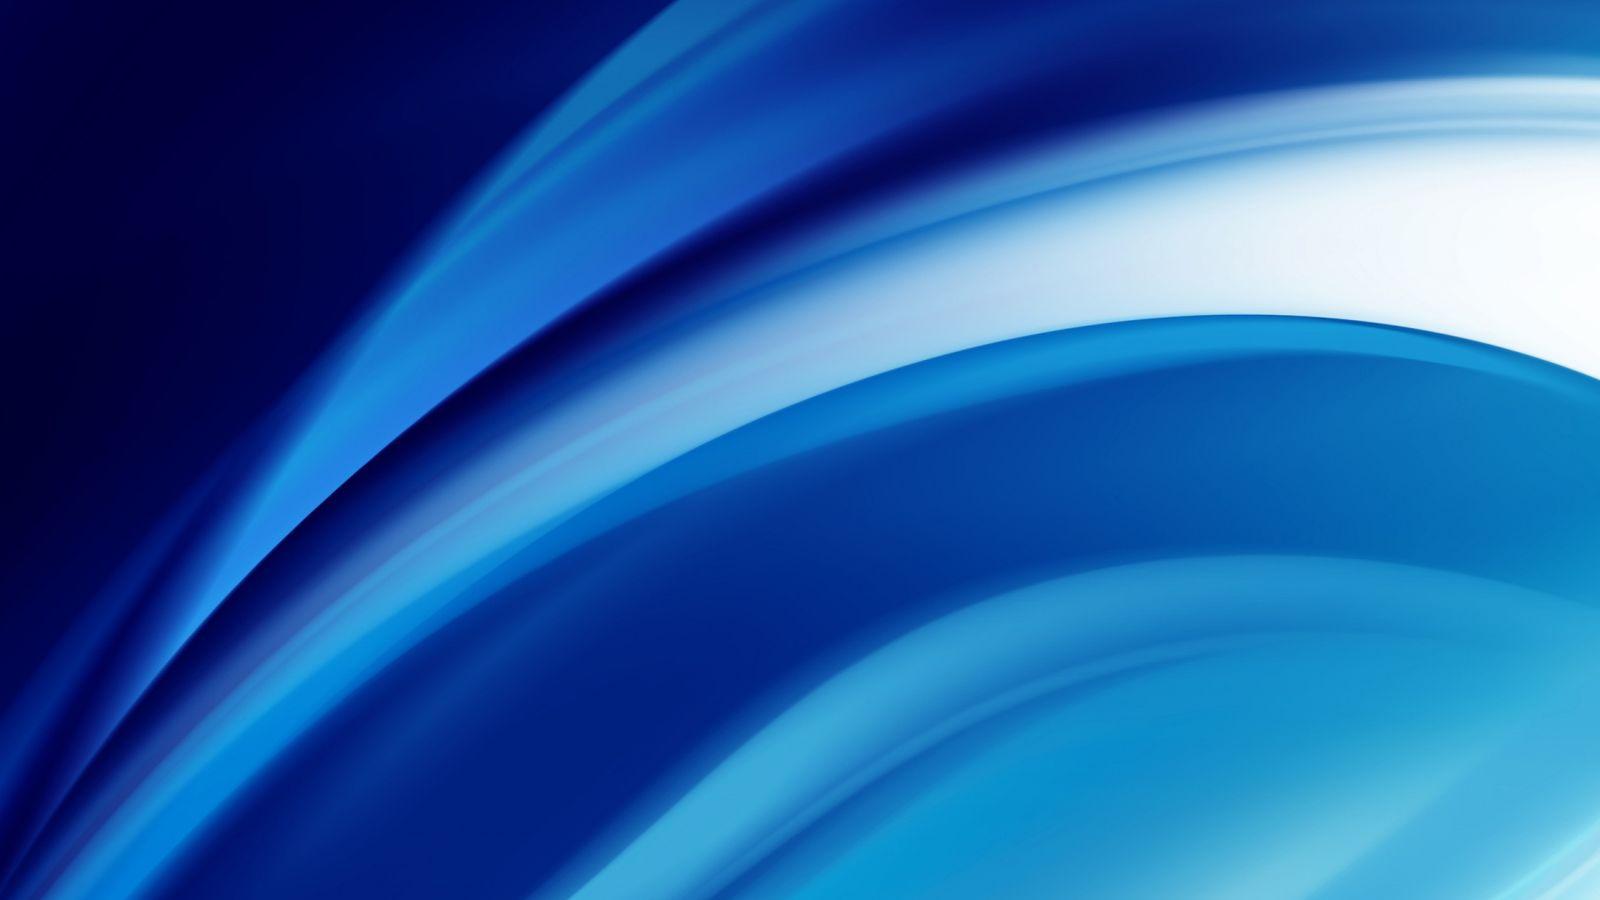 Fond Uni Design : Fond d écran bleu hd